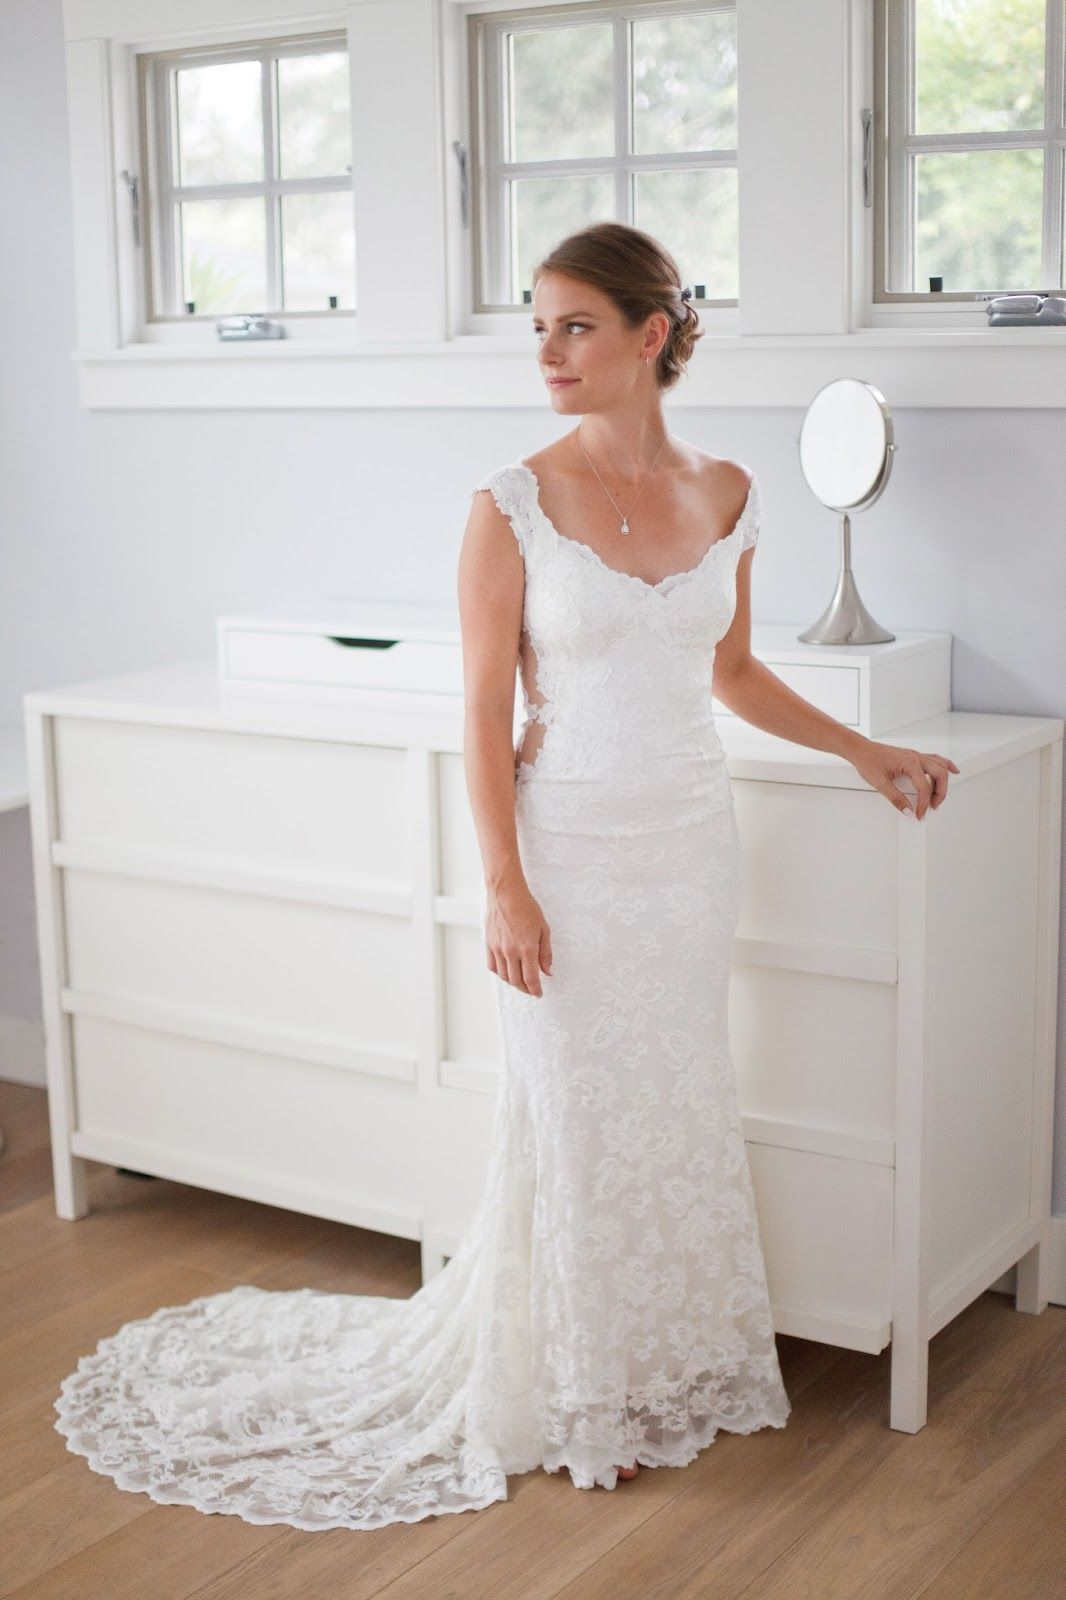 Olvis 1495 sw size 0 wedding dress wedding wedding dress and olvis 1495 sw size 0 wedding dress ombrellifo Image collections